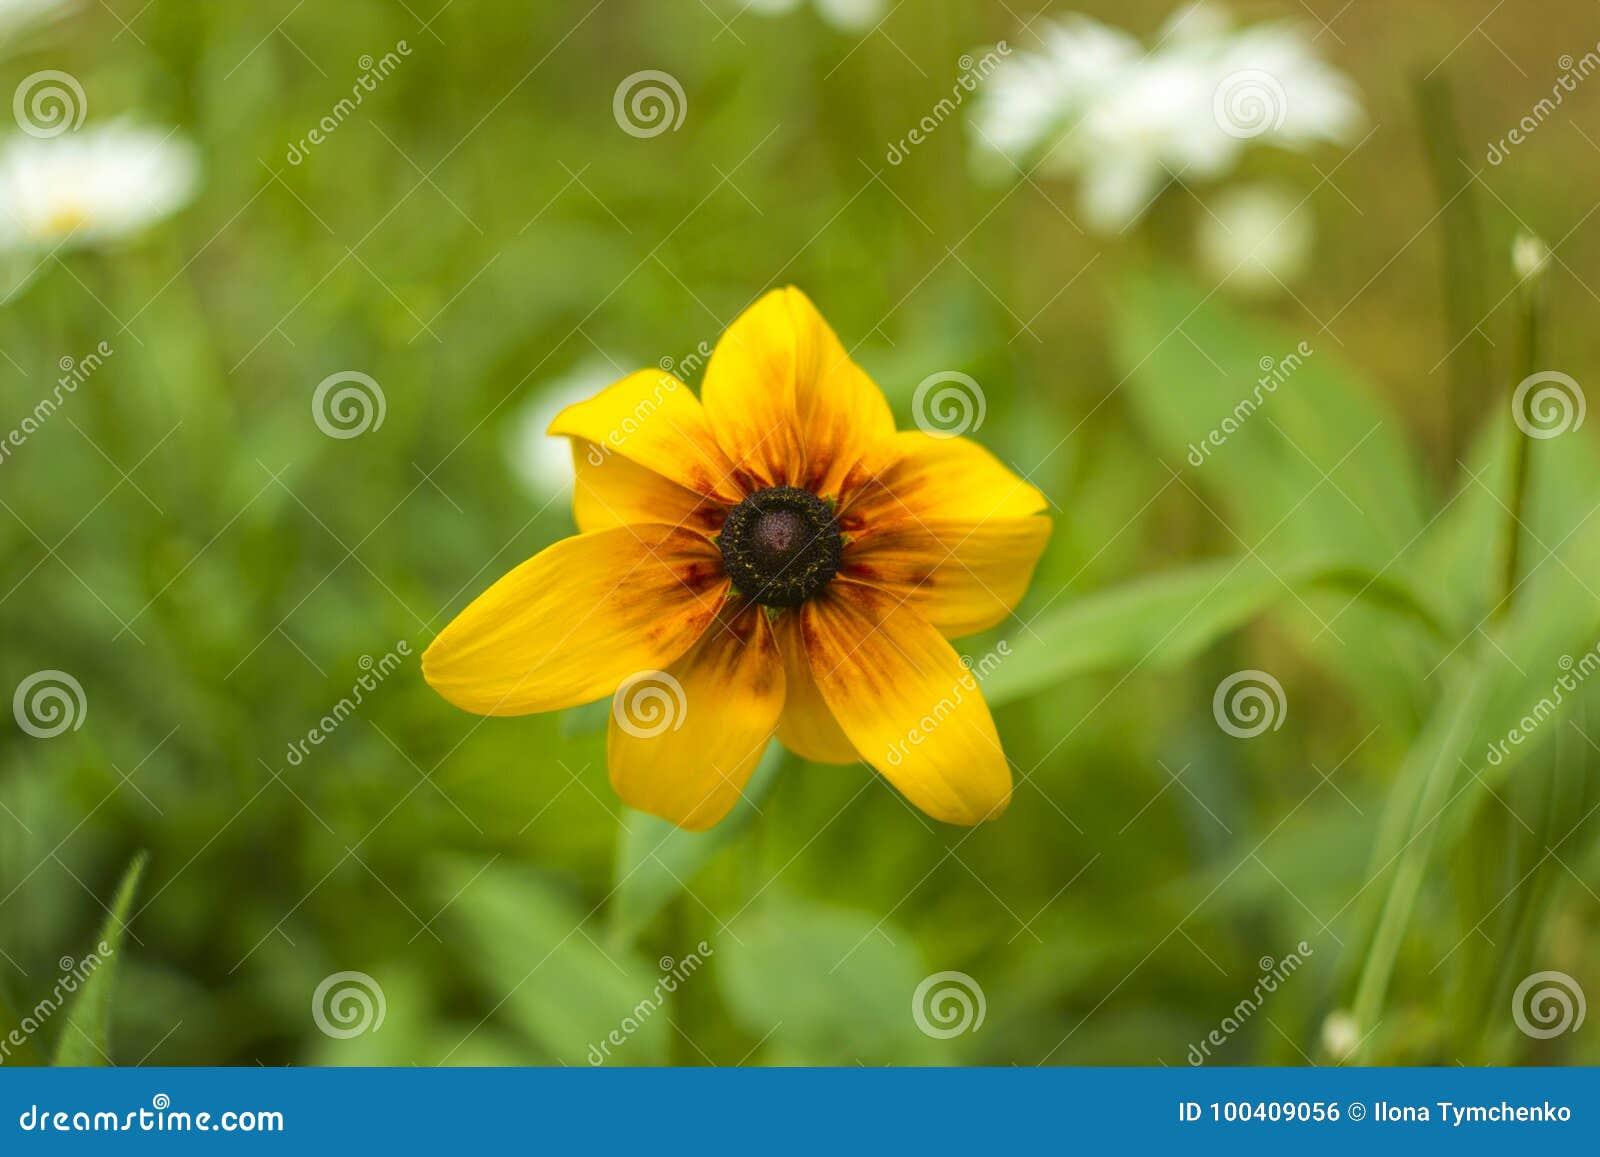 Sunny Yellow Flower Rudbeckia In Summer Garden Flowerbed Stock Photo